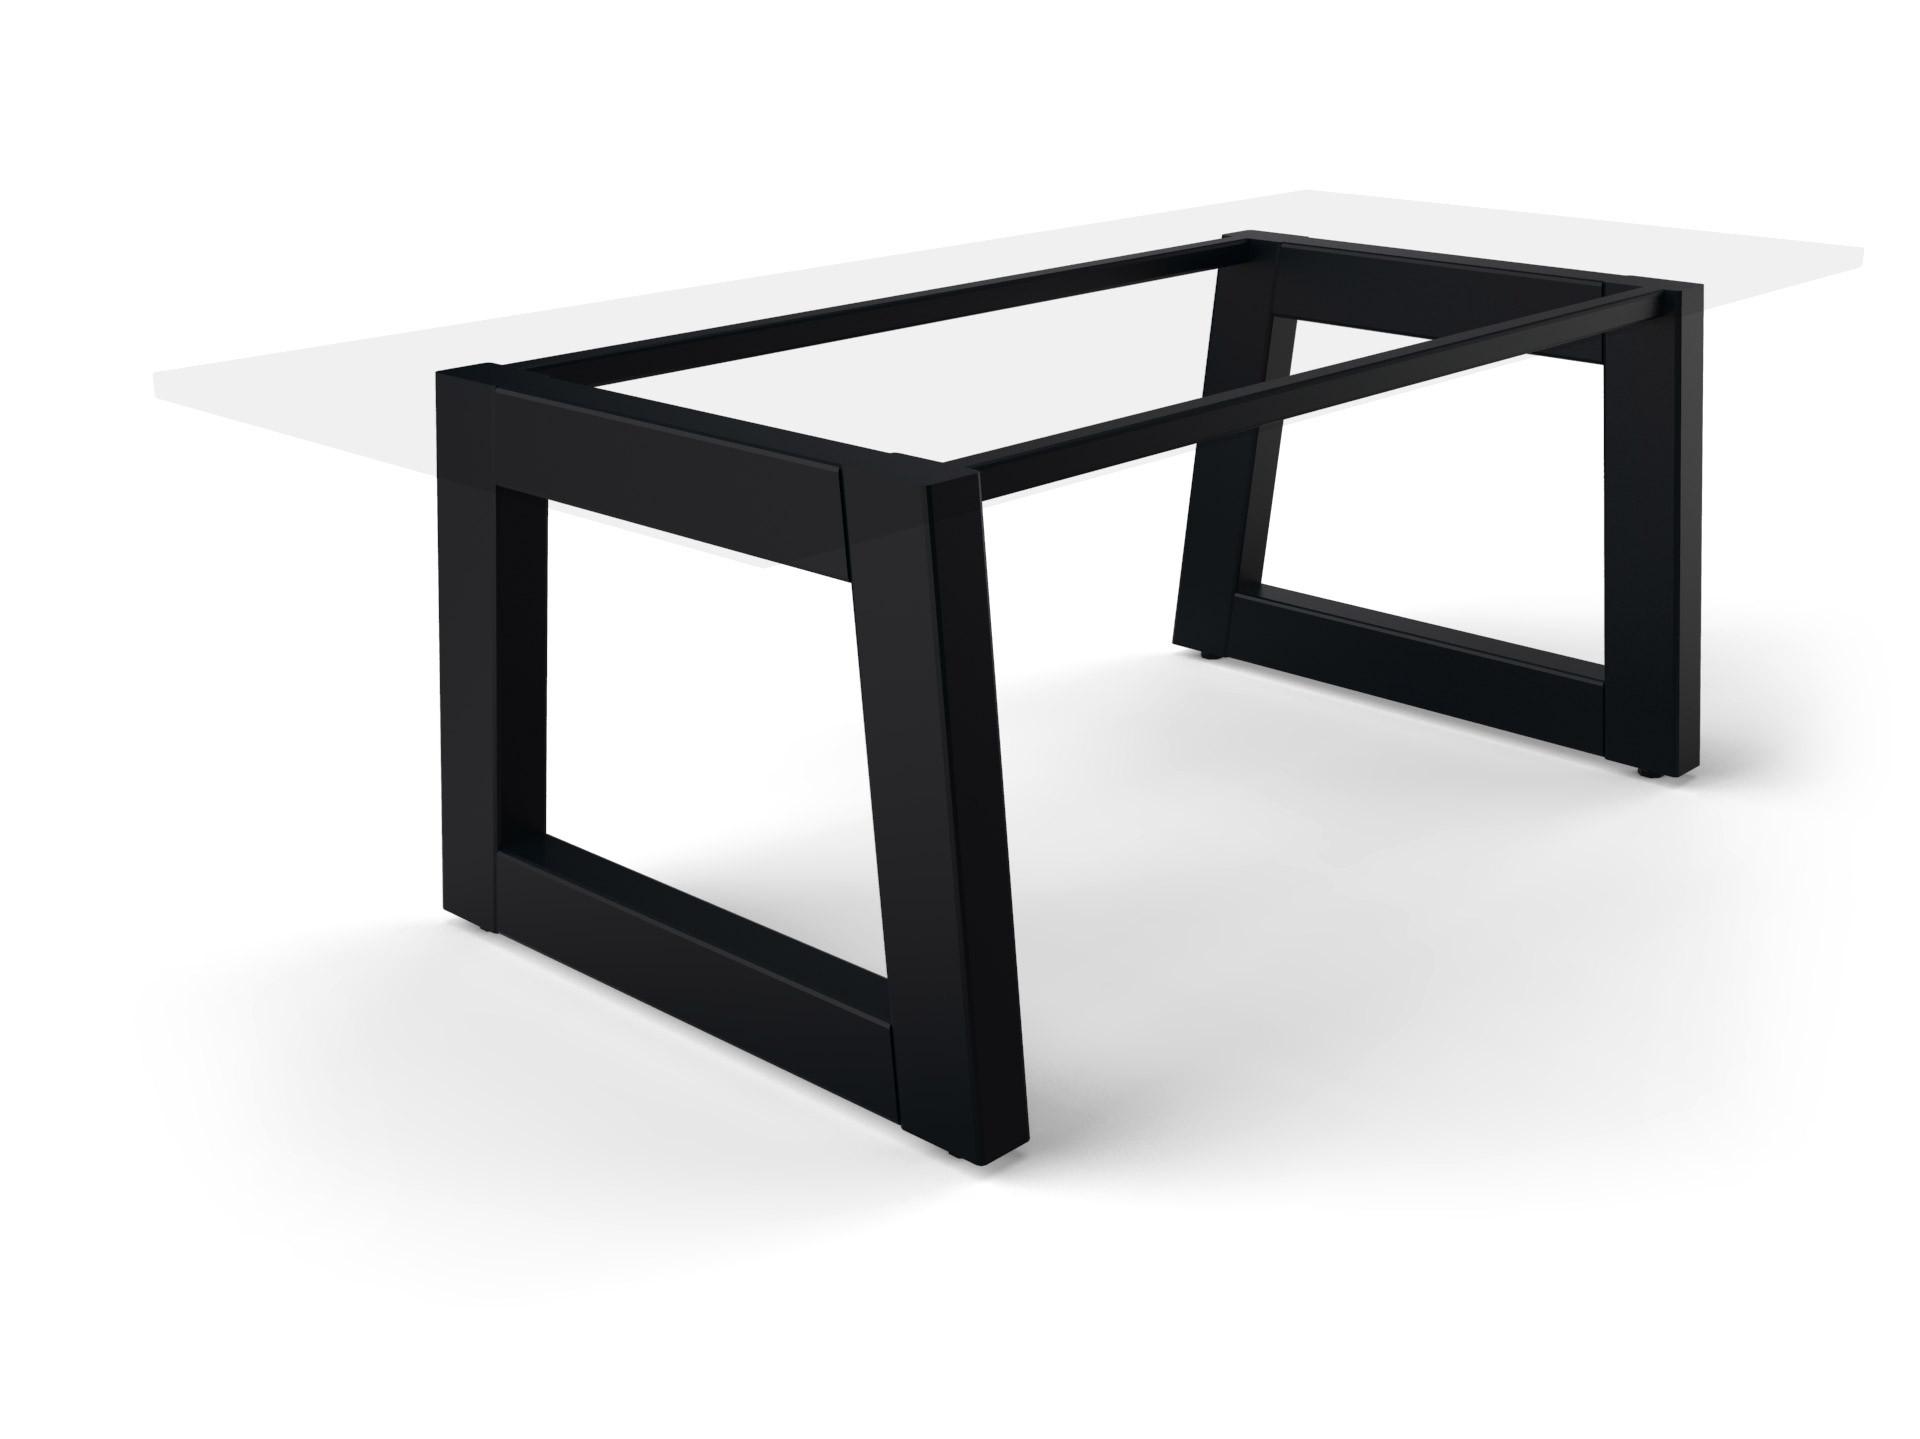 Tischgestell Novara